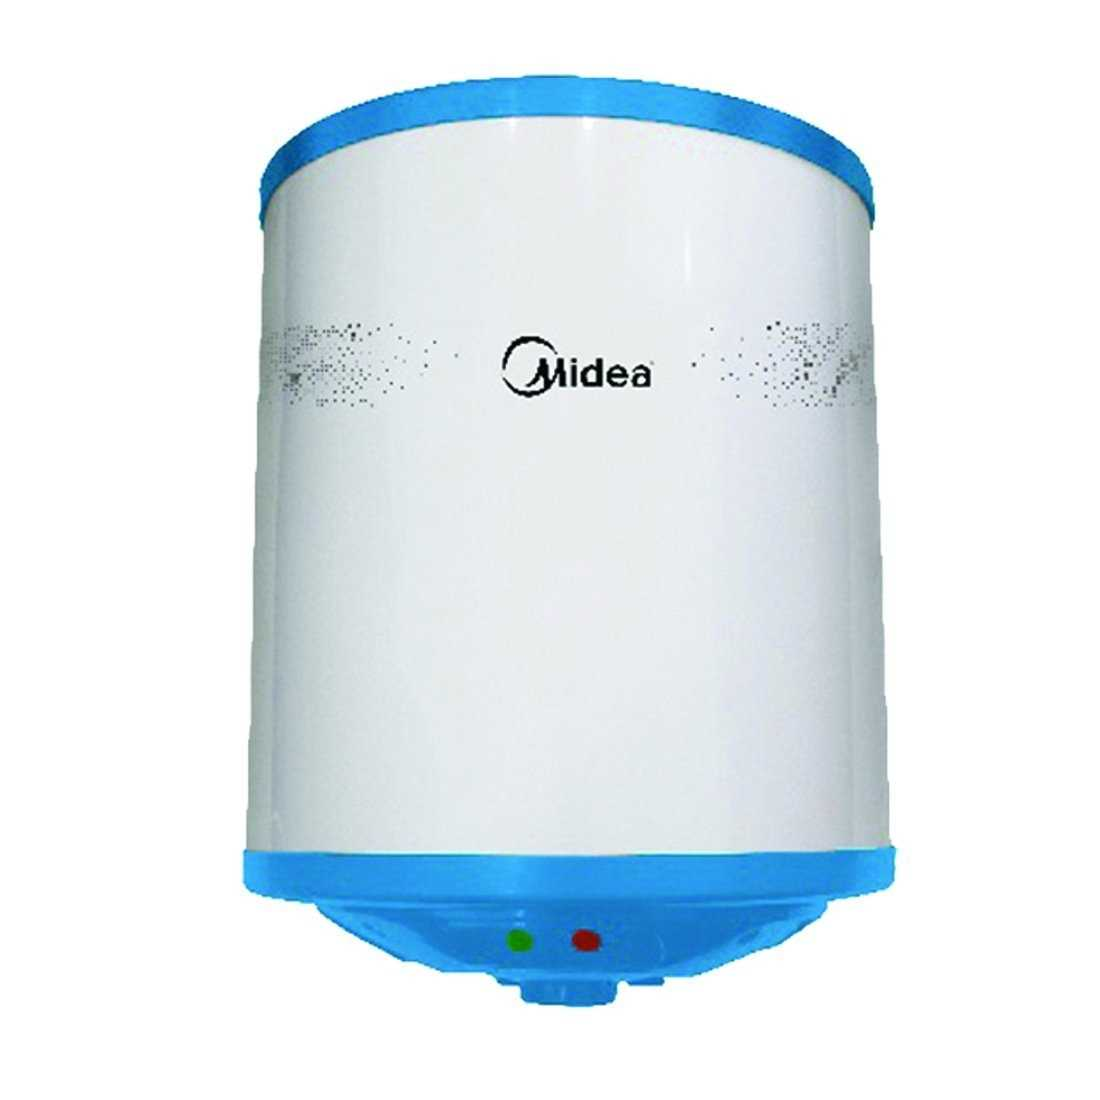 Midea MWHSA0066VK 6 Litre Storage Water Heater